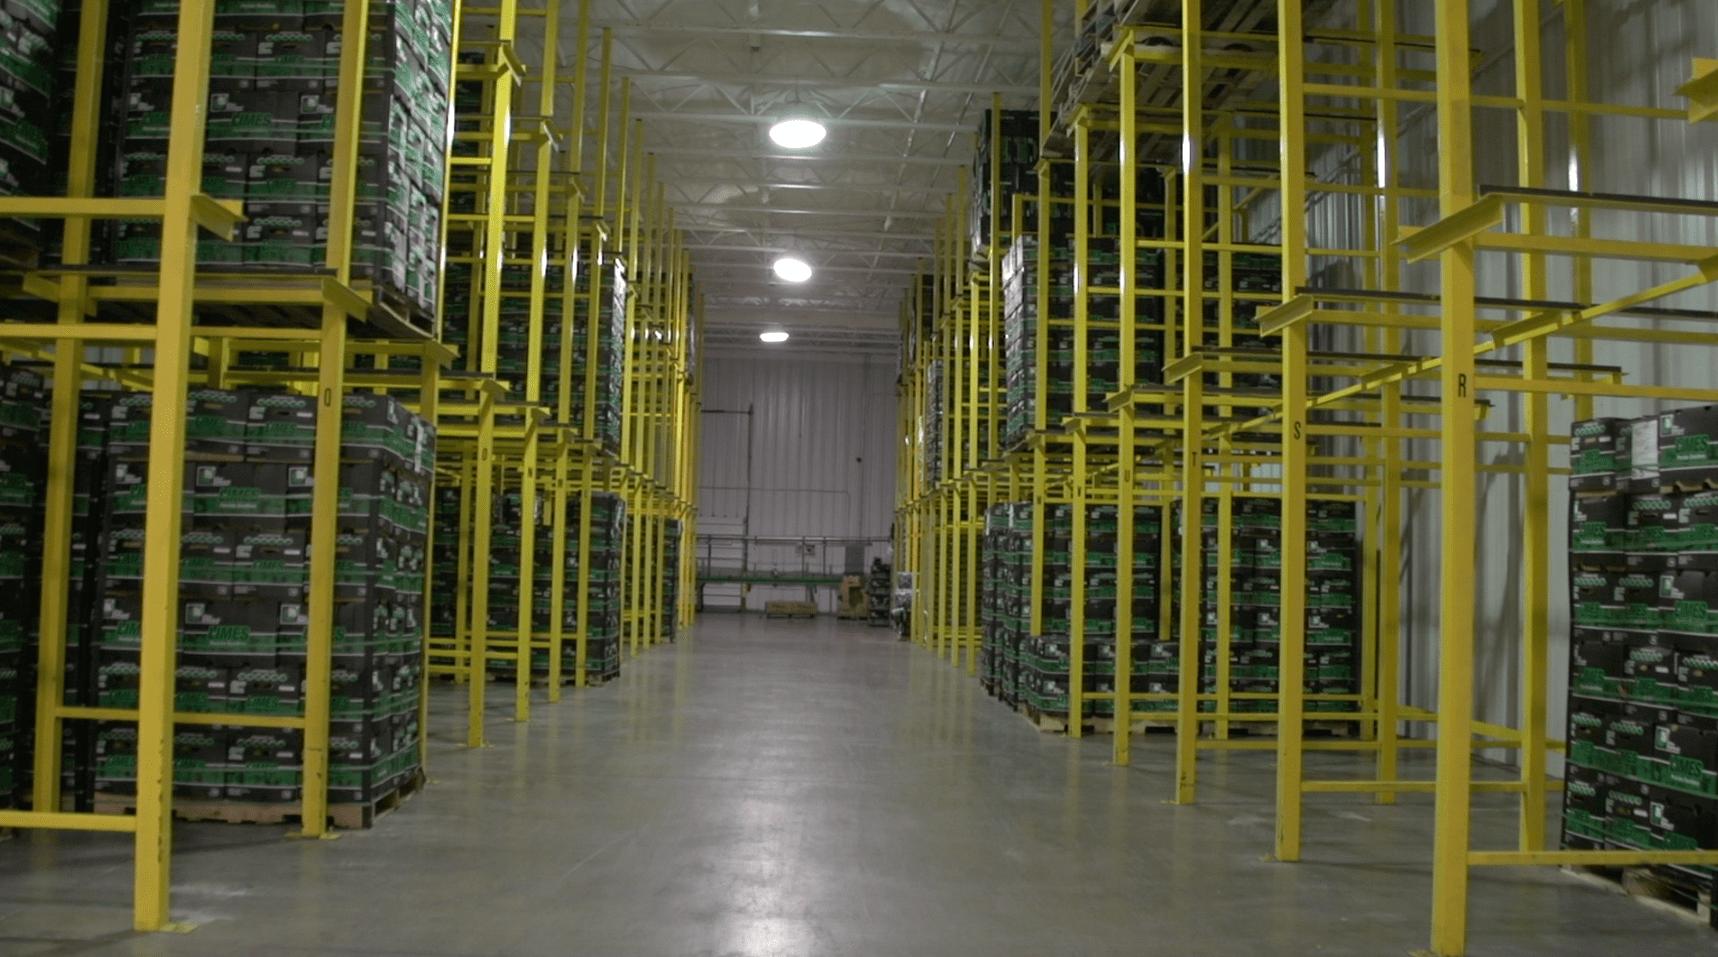 Warehousekingdom – Warehousekingdom